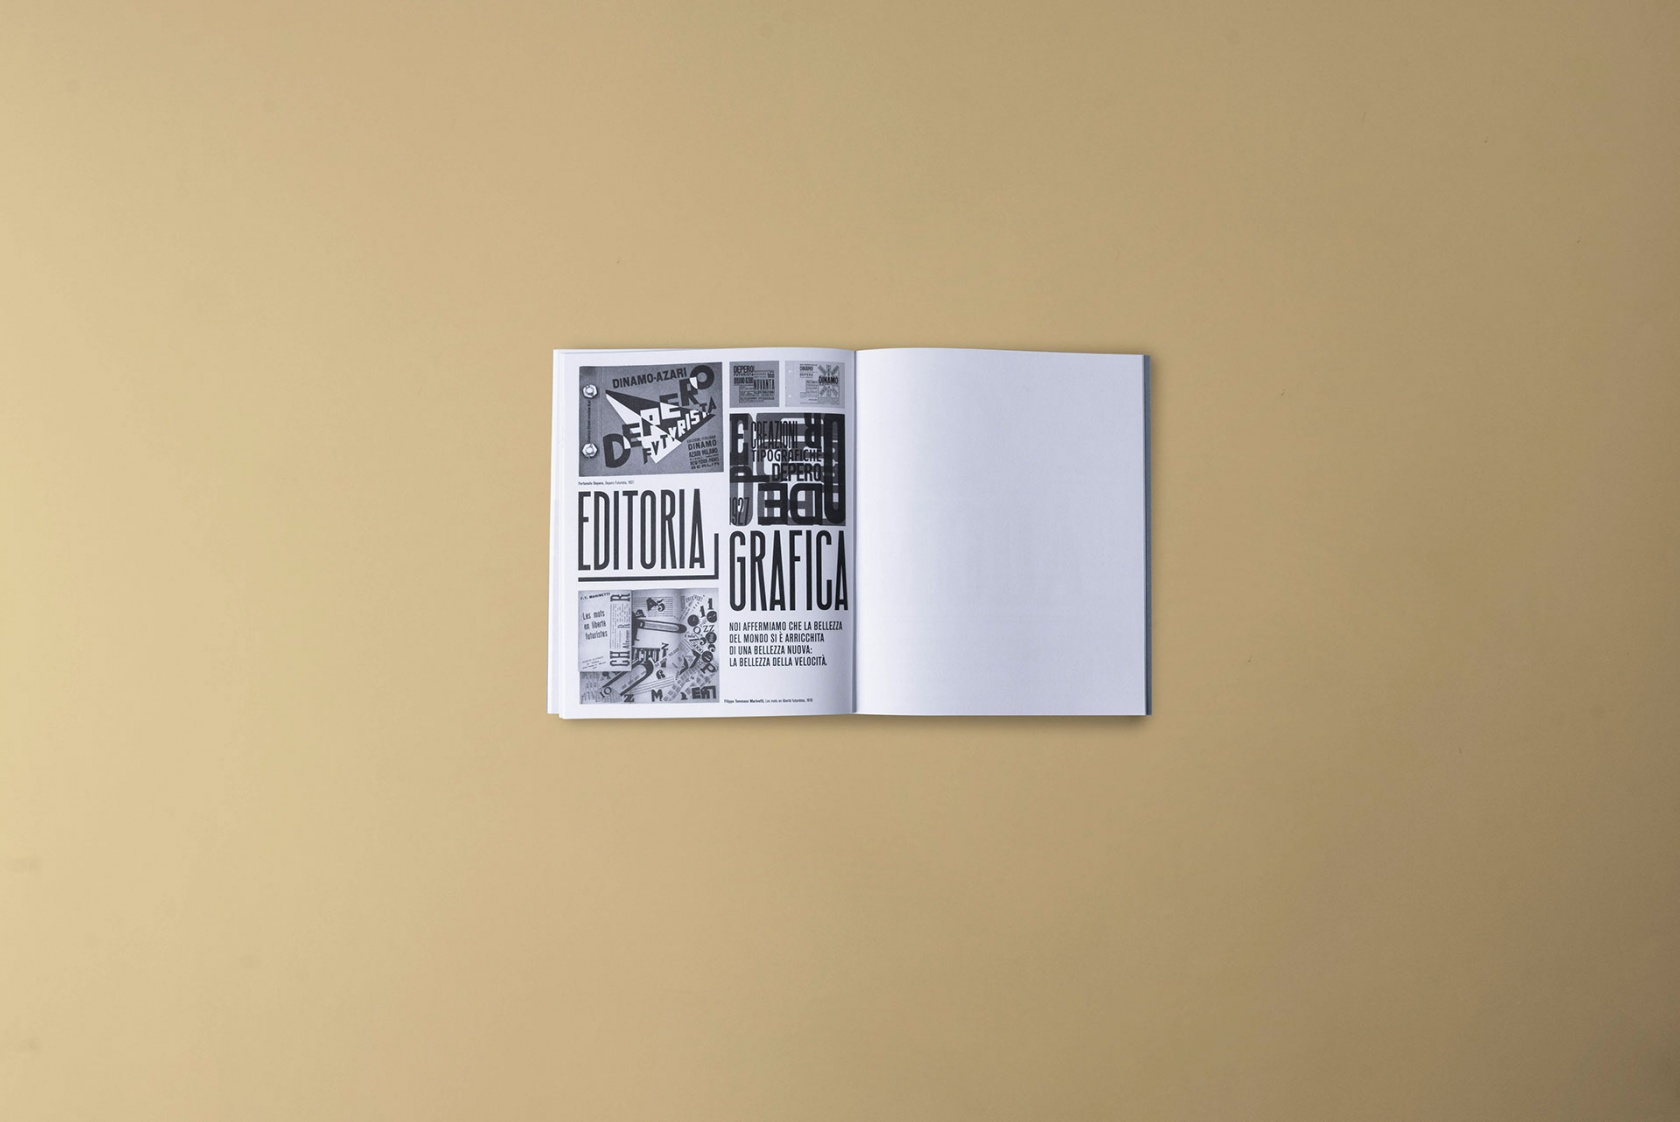 quaderno futurista editoria grafica lr 1680x1122 q95